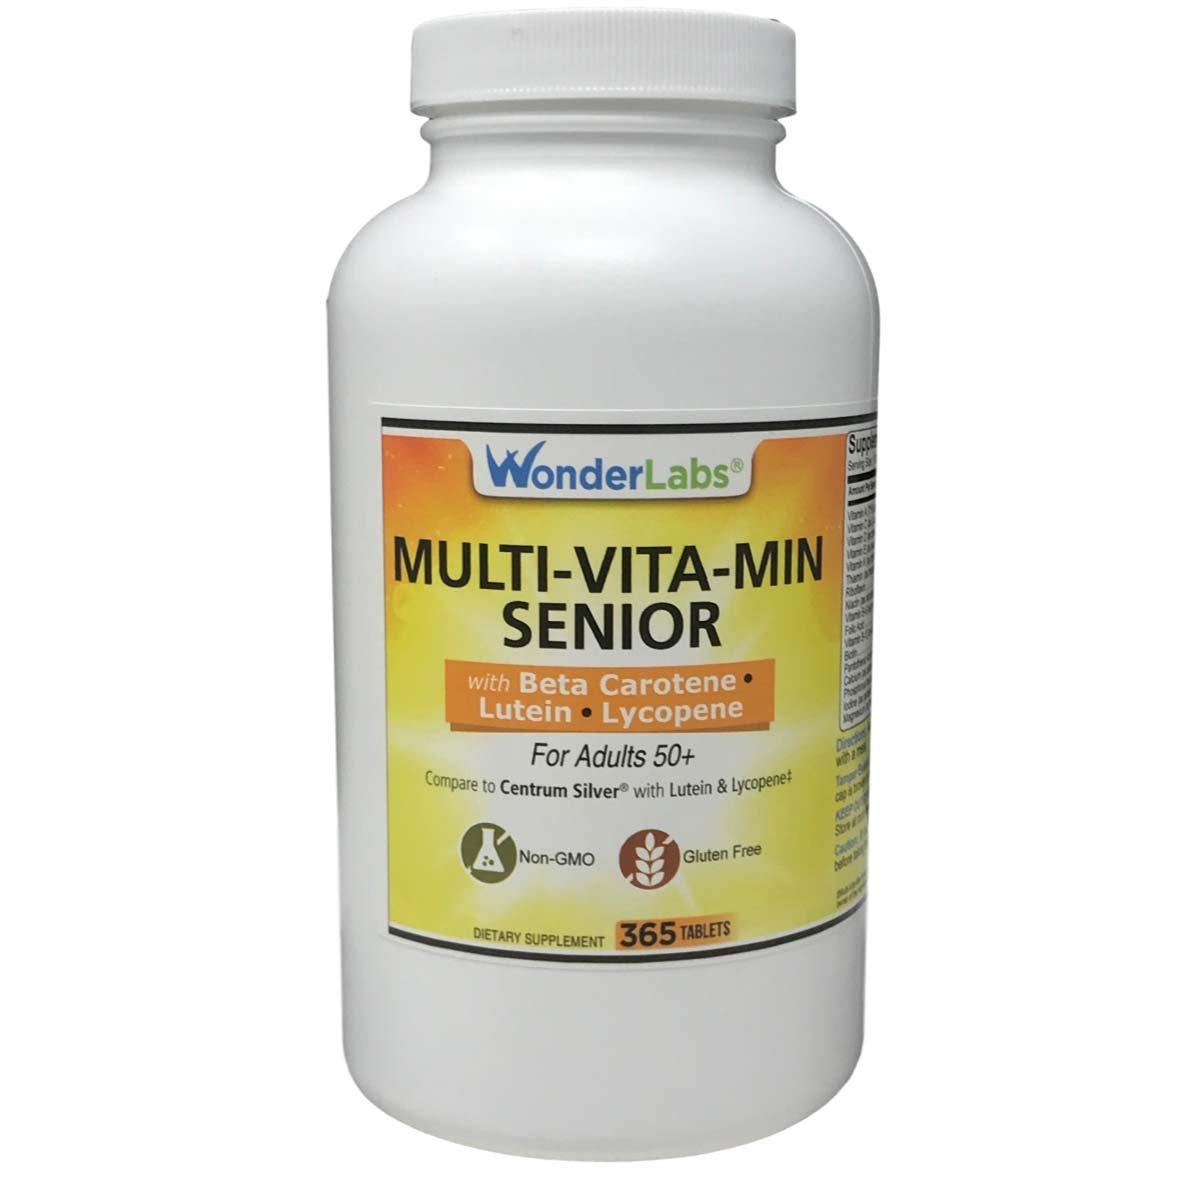 Multi-vitamin Multi-mineral Compare to Centrum Silver® Multivitamin Multimineral with Beta Carotene Especially for Adults 50 Plus - 365 Tablets #2914